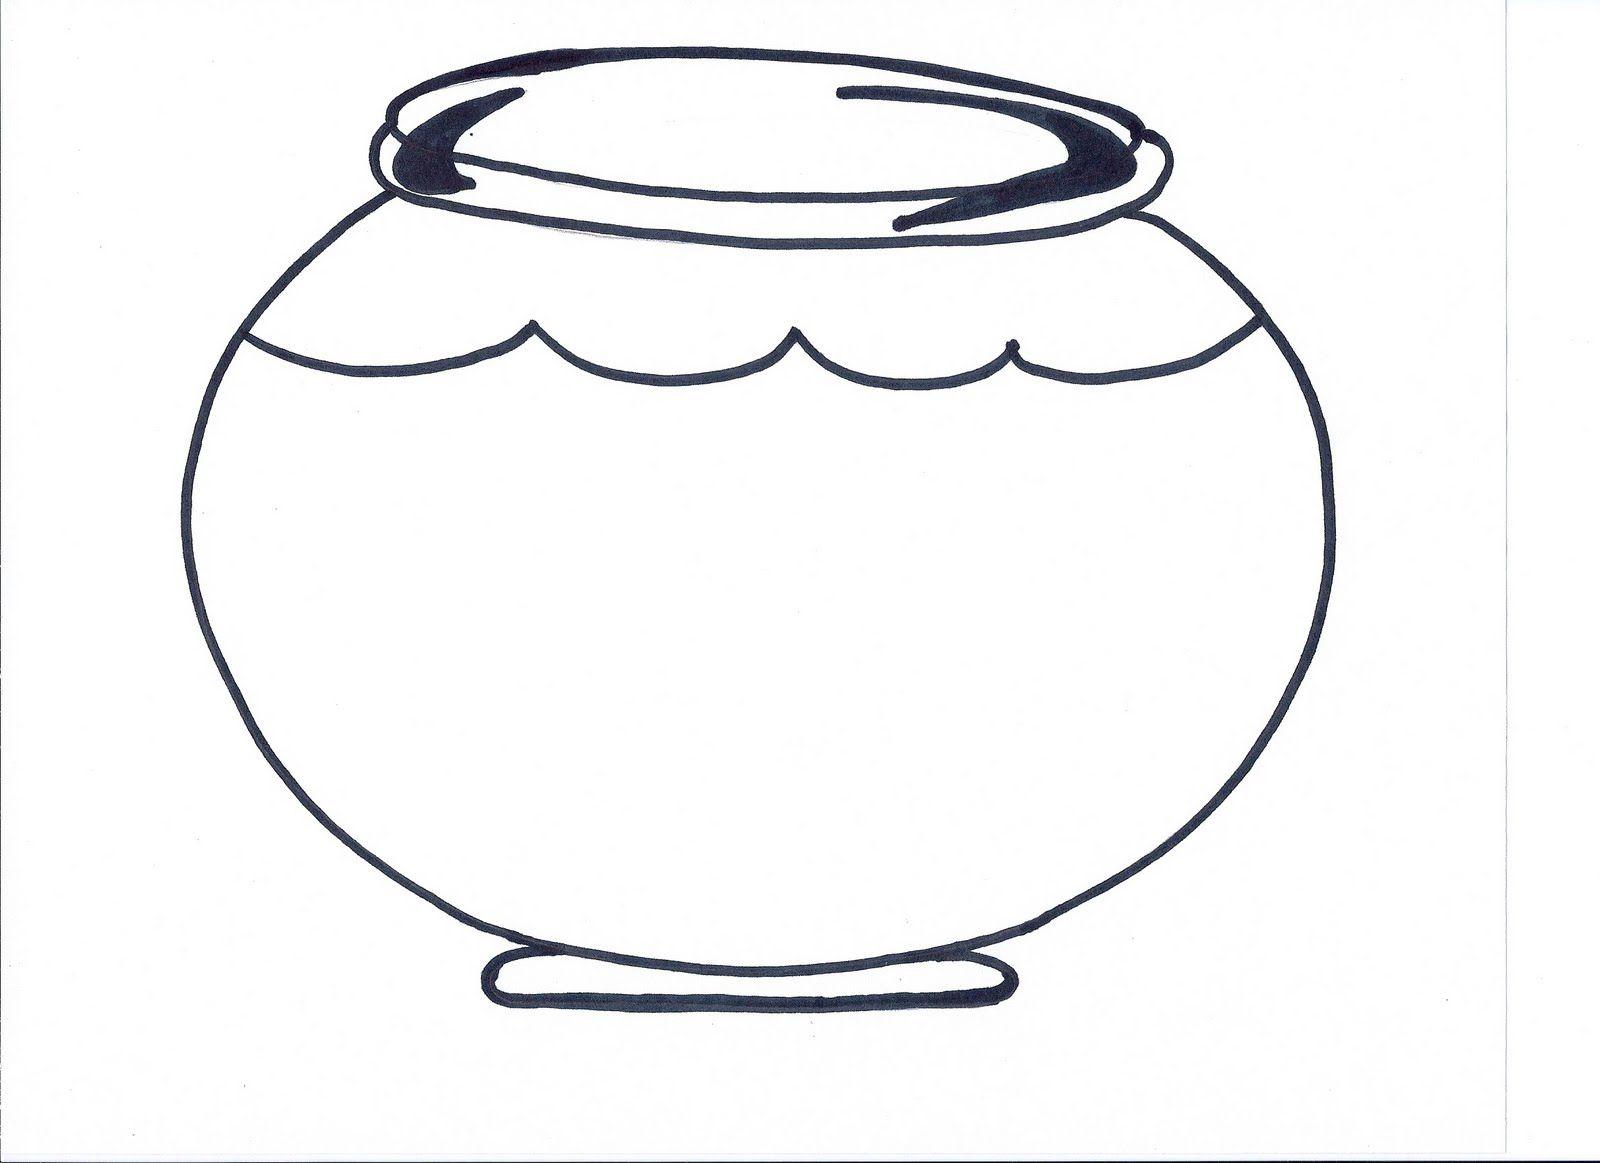 Learning And Teaching With Preschoolers Fishbowl Math Dr Seuss Crafts Dr Seuss Preschool Crafts Seuss Crafts